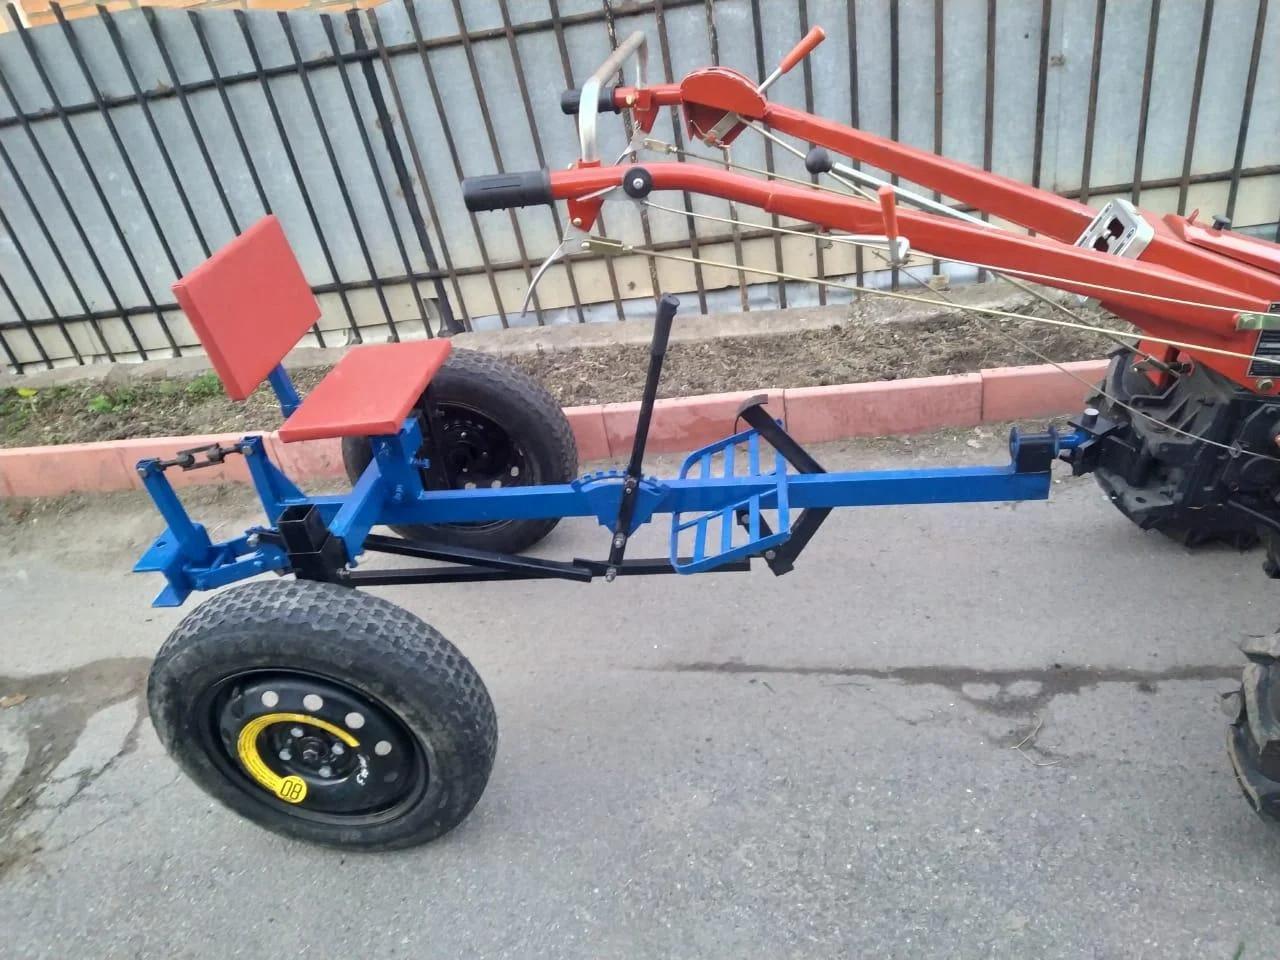 Адаптер для мотоблока под жигулевские колёса